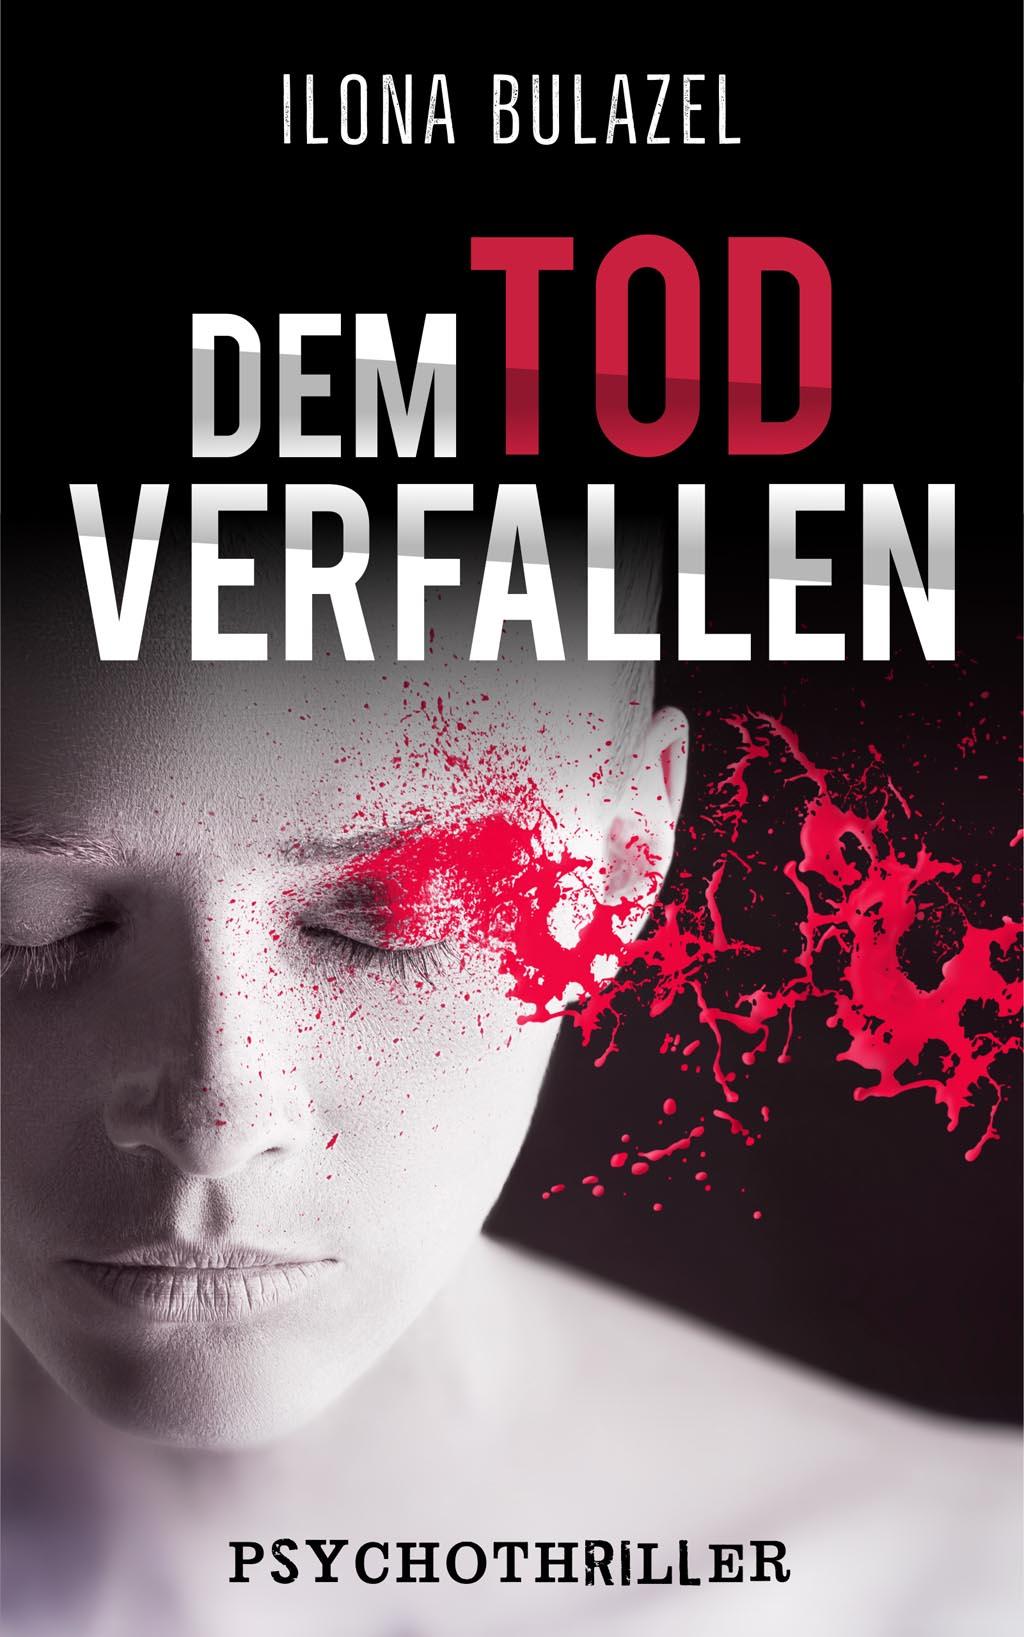 Ilona Bulazel - Dem Tod verfallen